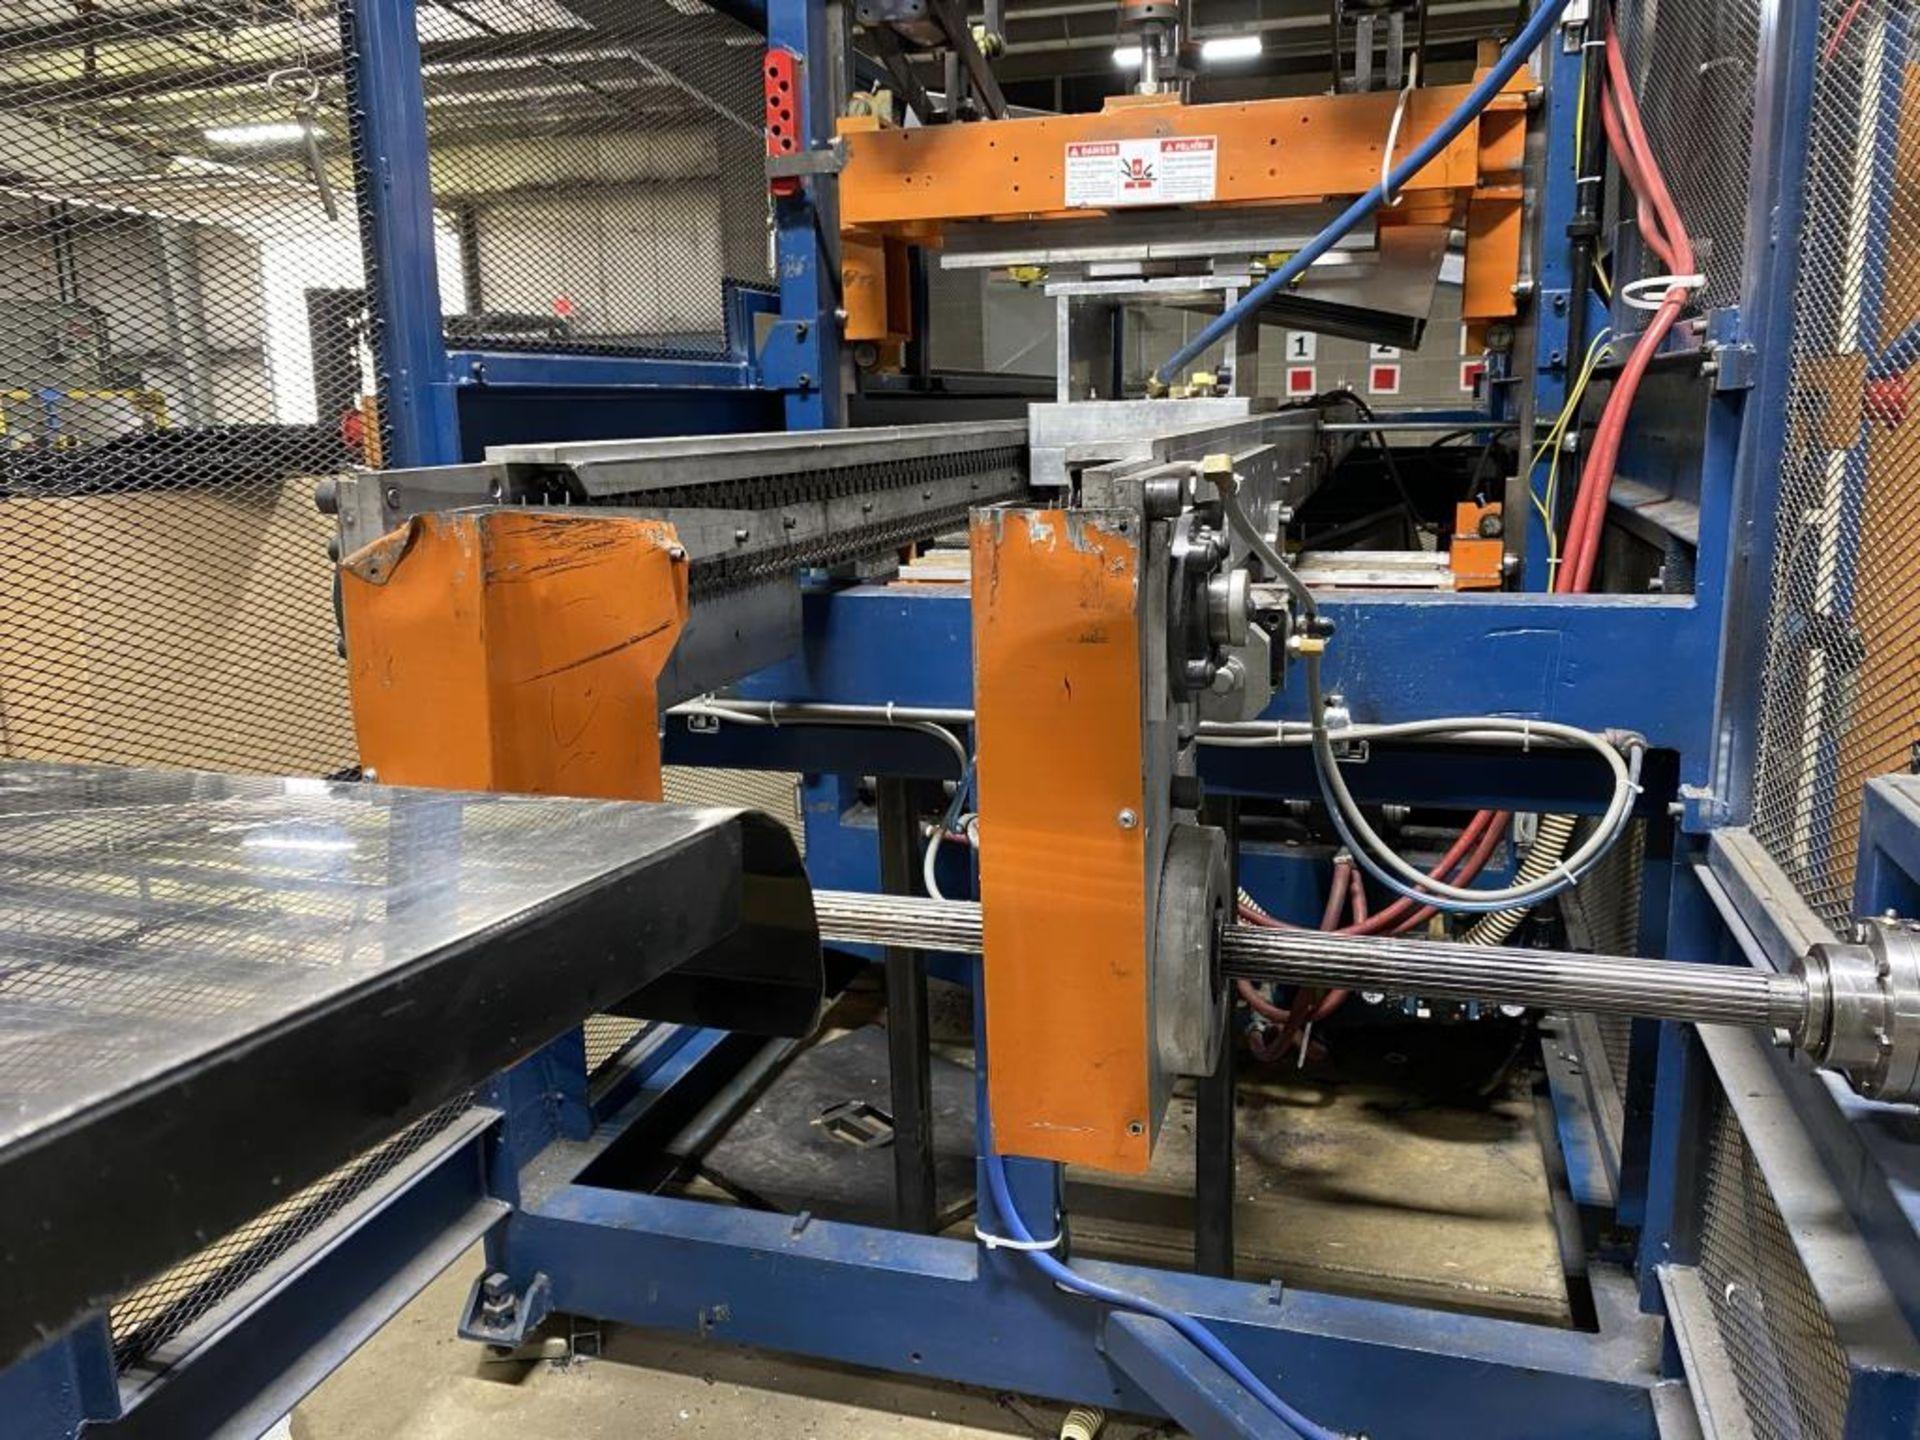 Rebuilt Thin Gauge Thermoformer - Image 8 of 18